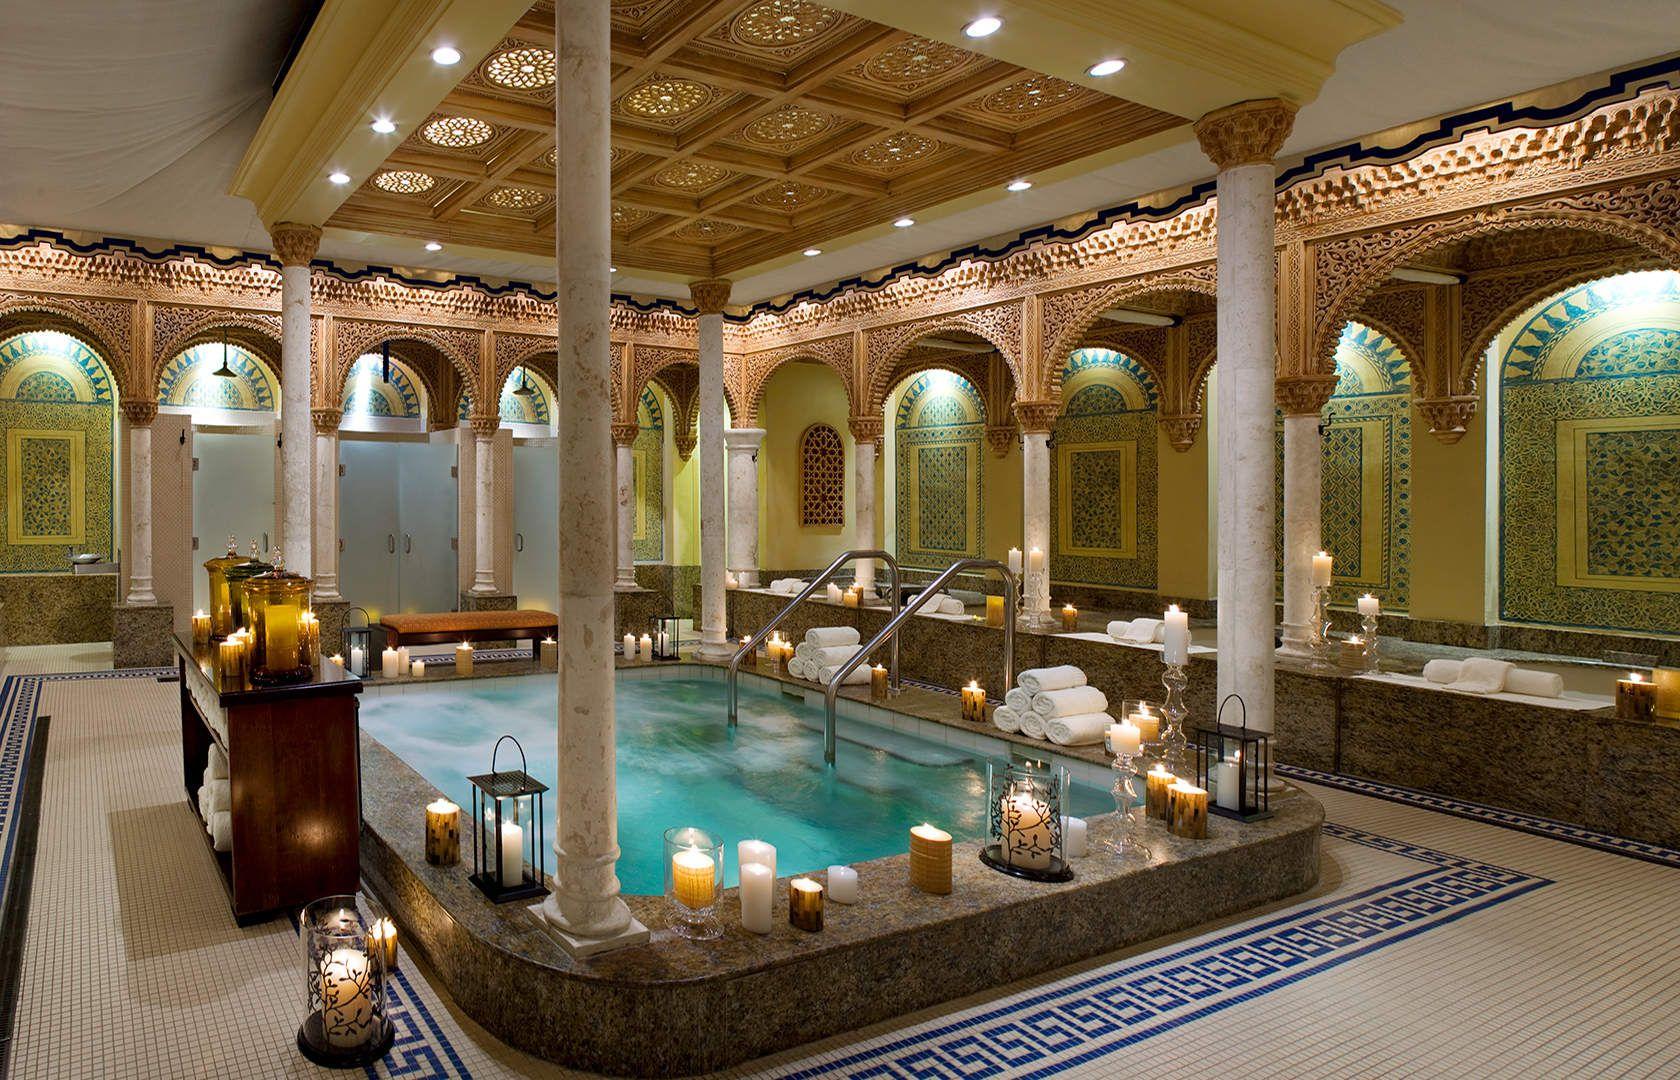 Best Kitchen Gallery: Best Florida Spa Boca Raton Resort Club Pinterest Waldorf of Luxury Resorts Hotels Boca Raton  on rachelxblog.com